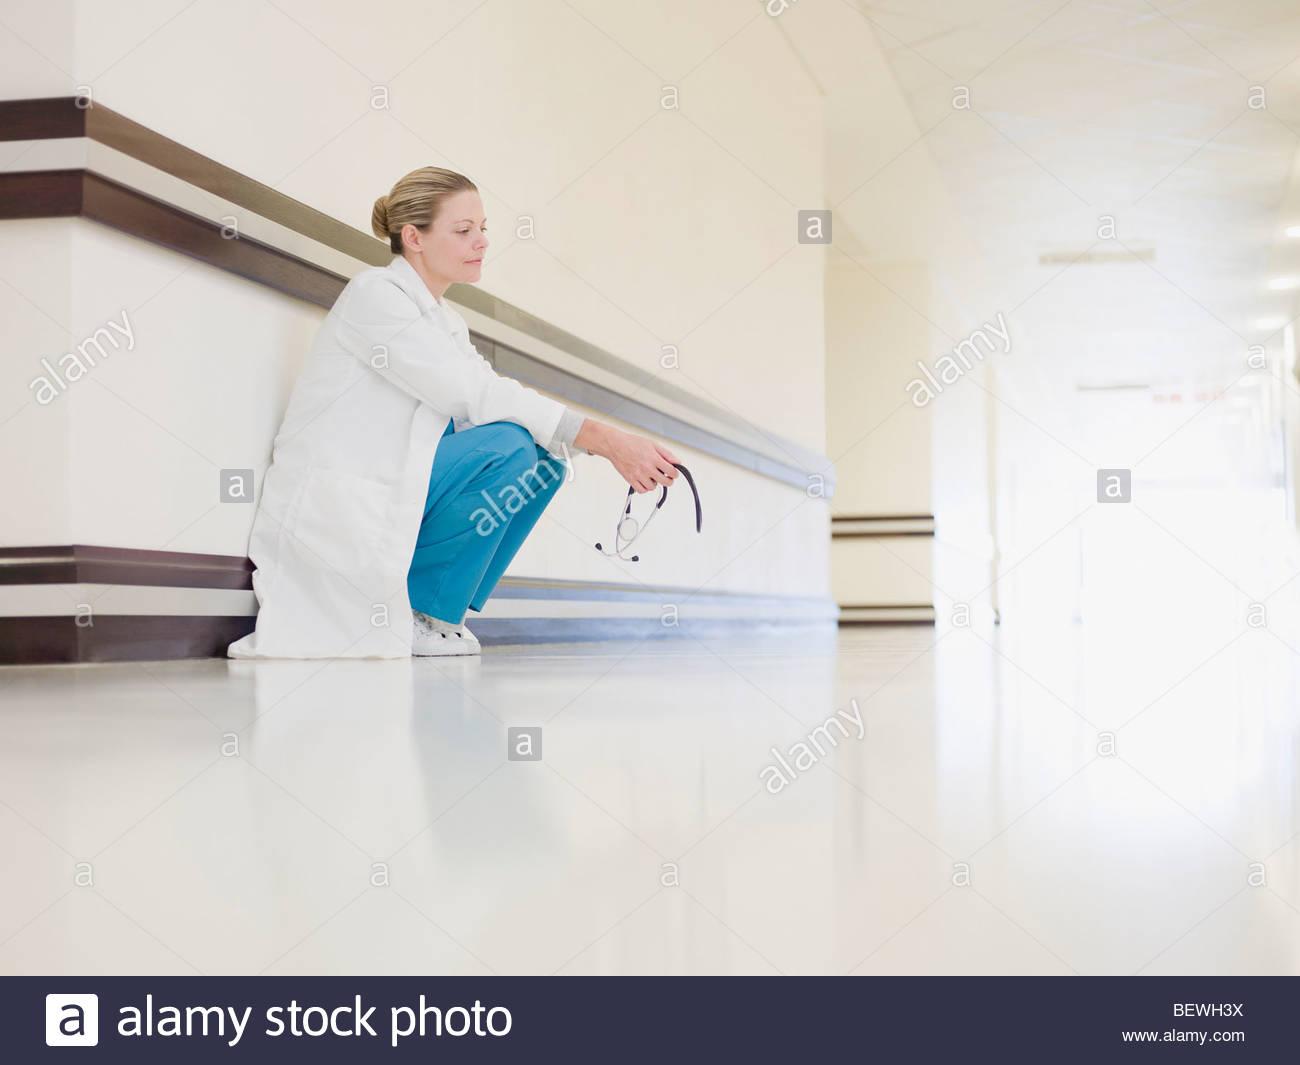 Doctor squatting in hospital corridor - Stock Image